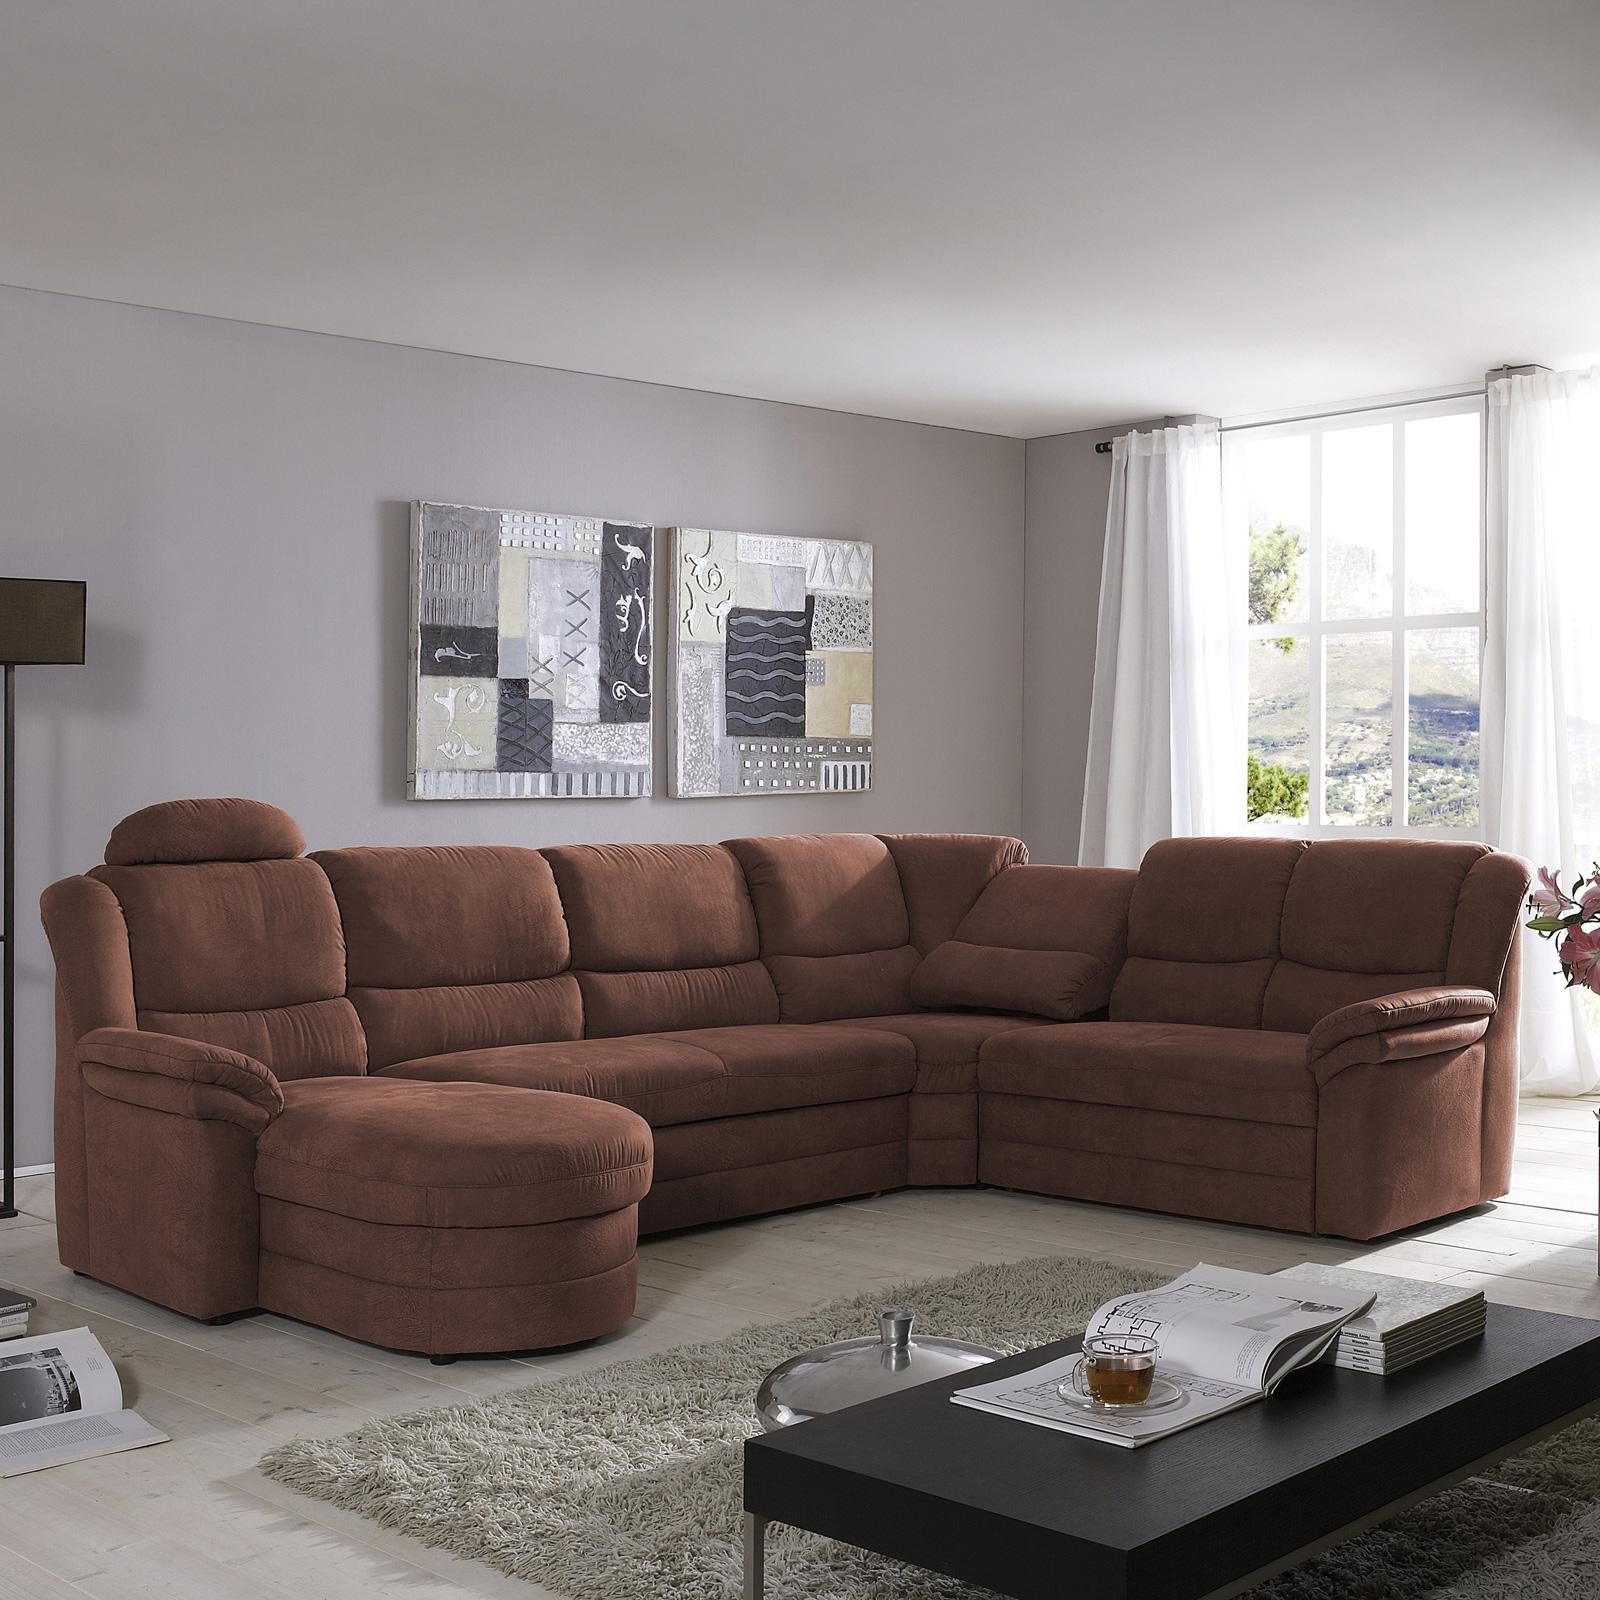 Sofa Kopenhagen ecksofa kopenhagen sofa polsterecke wohnlandschaft u sofa in braun